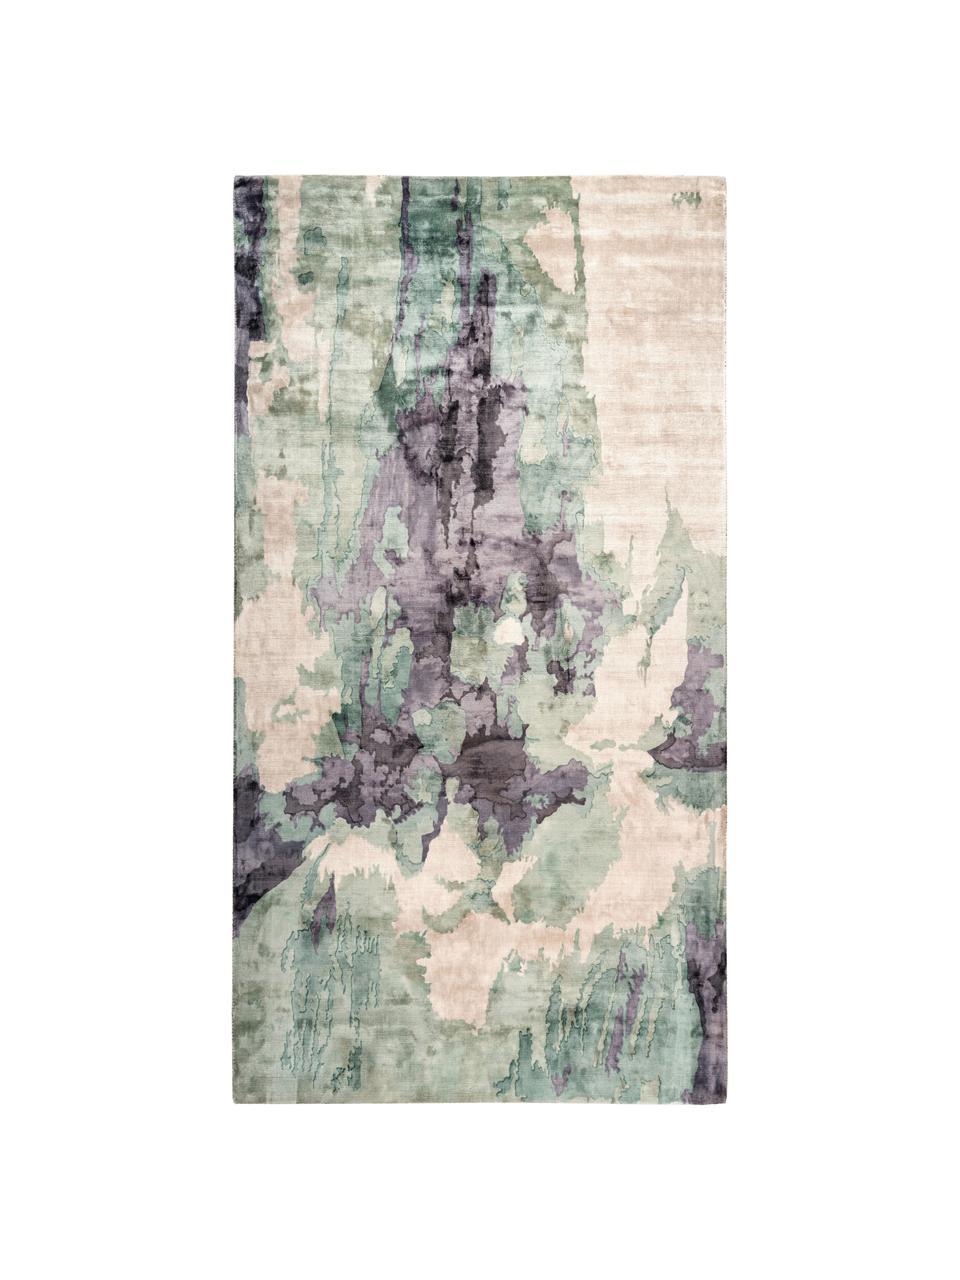 Viskosenteppich Malu mit abstraktem Muster, Flor: 100% Viskose, Beige, Grün, Grau, B 80 x L 150 cm (Größe XS)